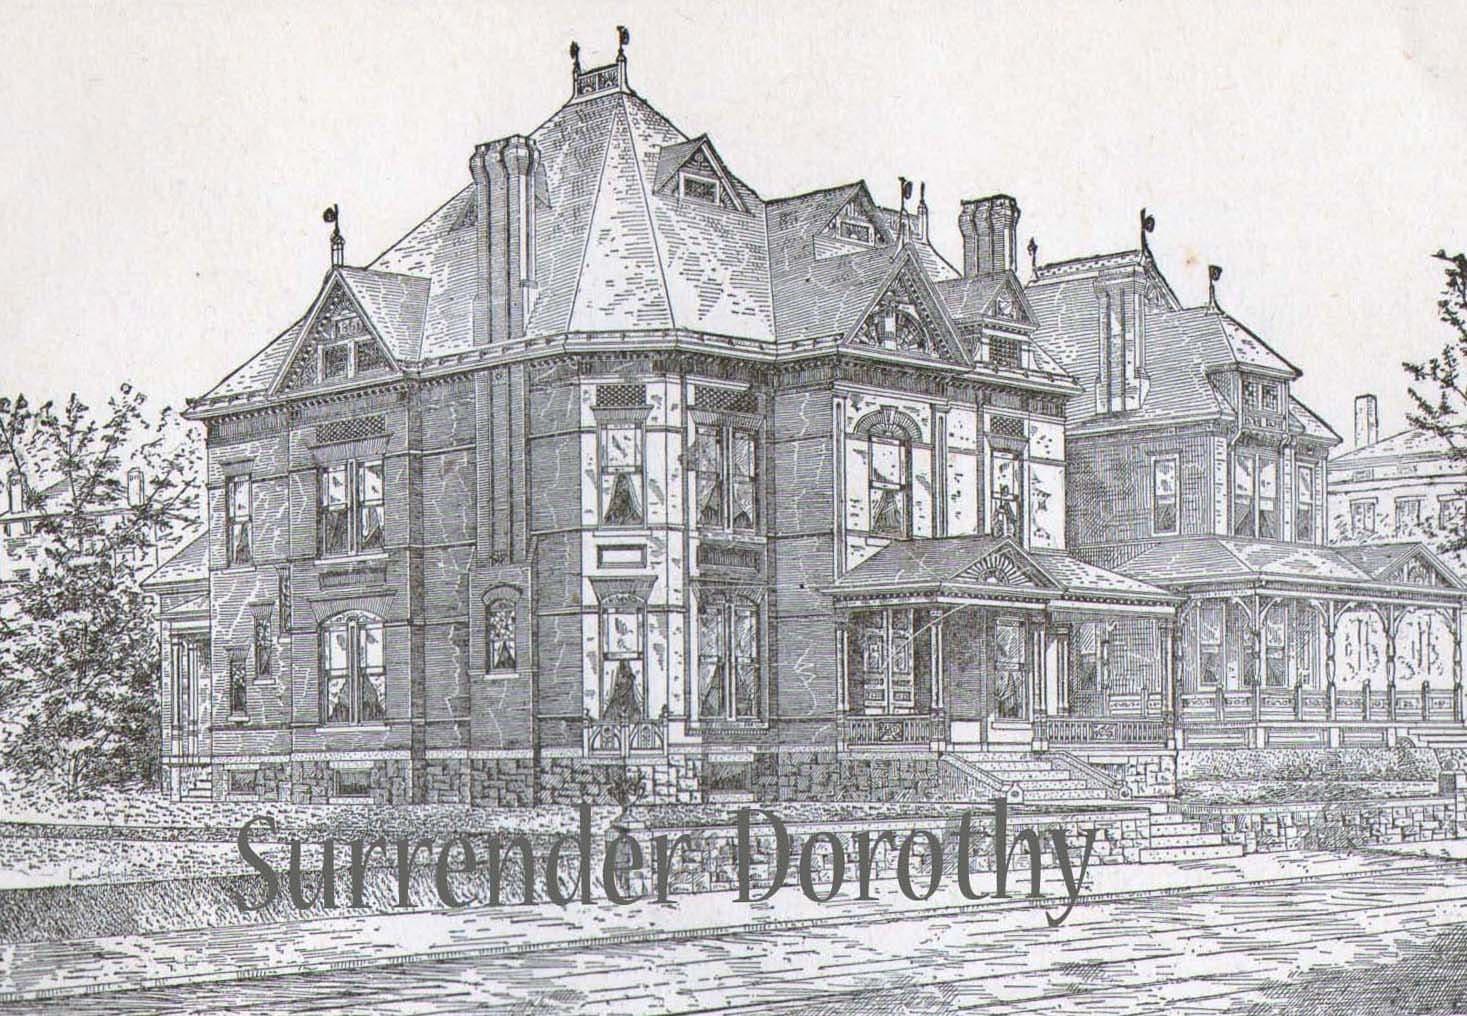 Gothic brick dwelling plans antique victorian architecture for Vintage victorian house plans